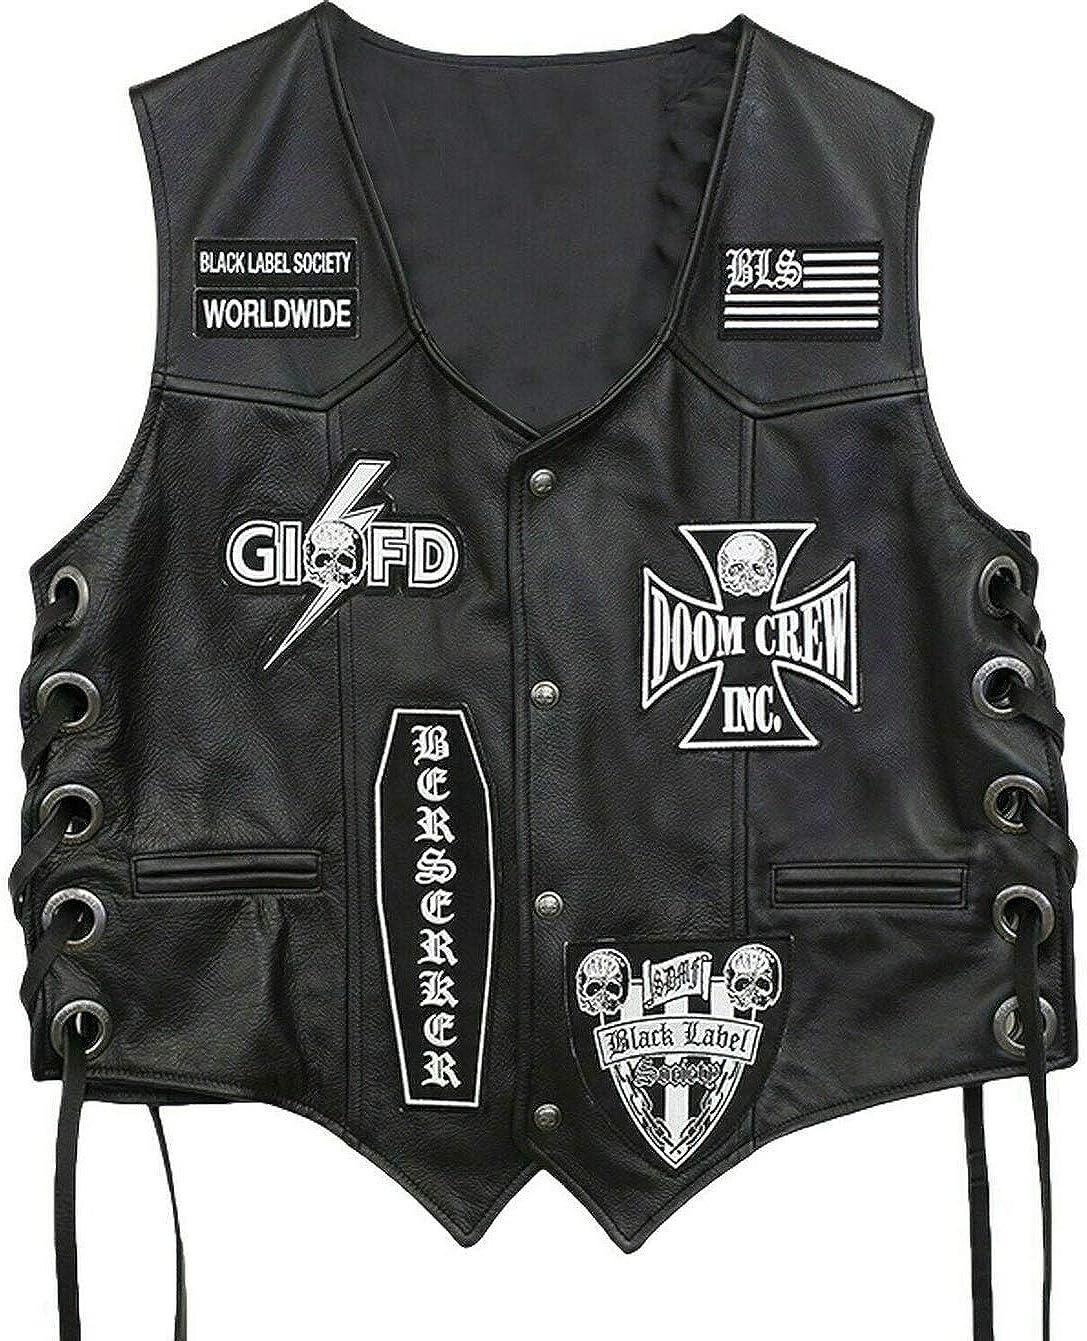 Black Label セール価格 Society Skull Real Leather 正規品スーパーSALE×店内全品キャンペーン Vest Biker